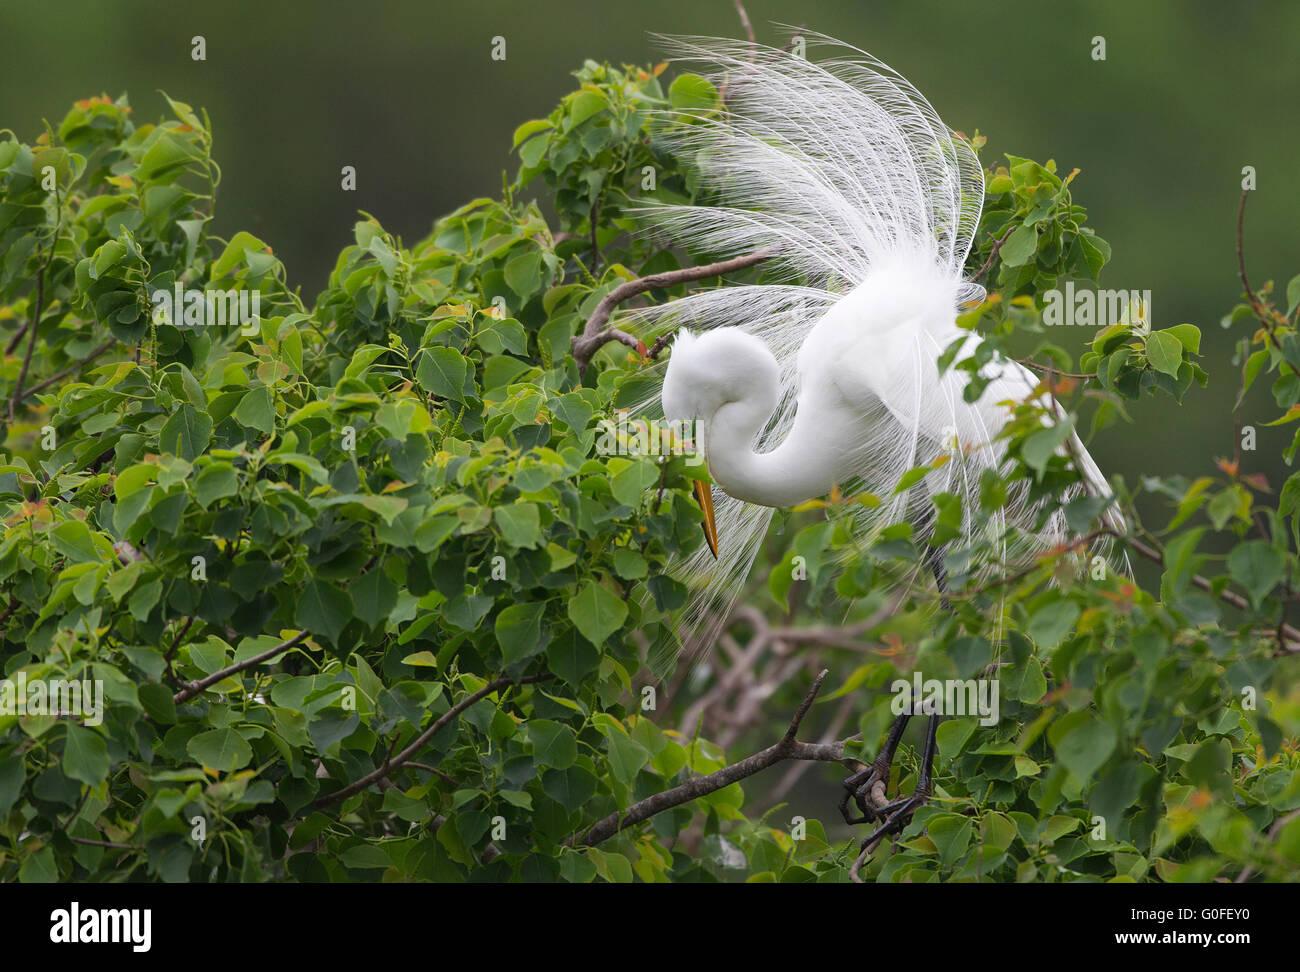 Great Egret Displaying Breeding Plumage - Stock Image